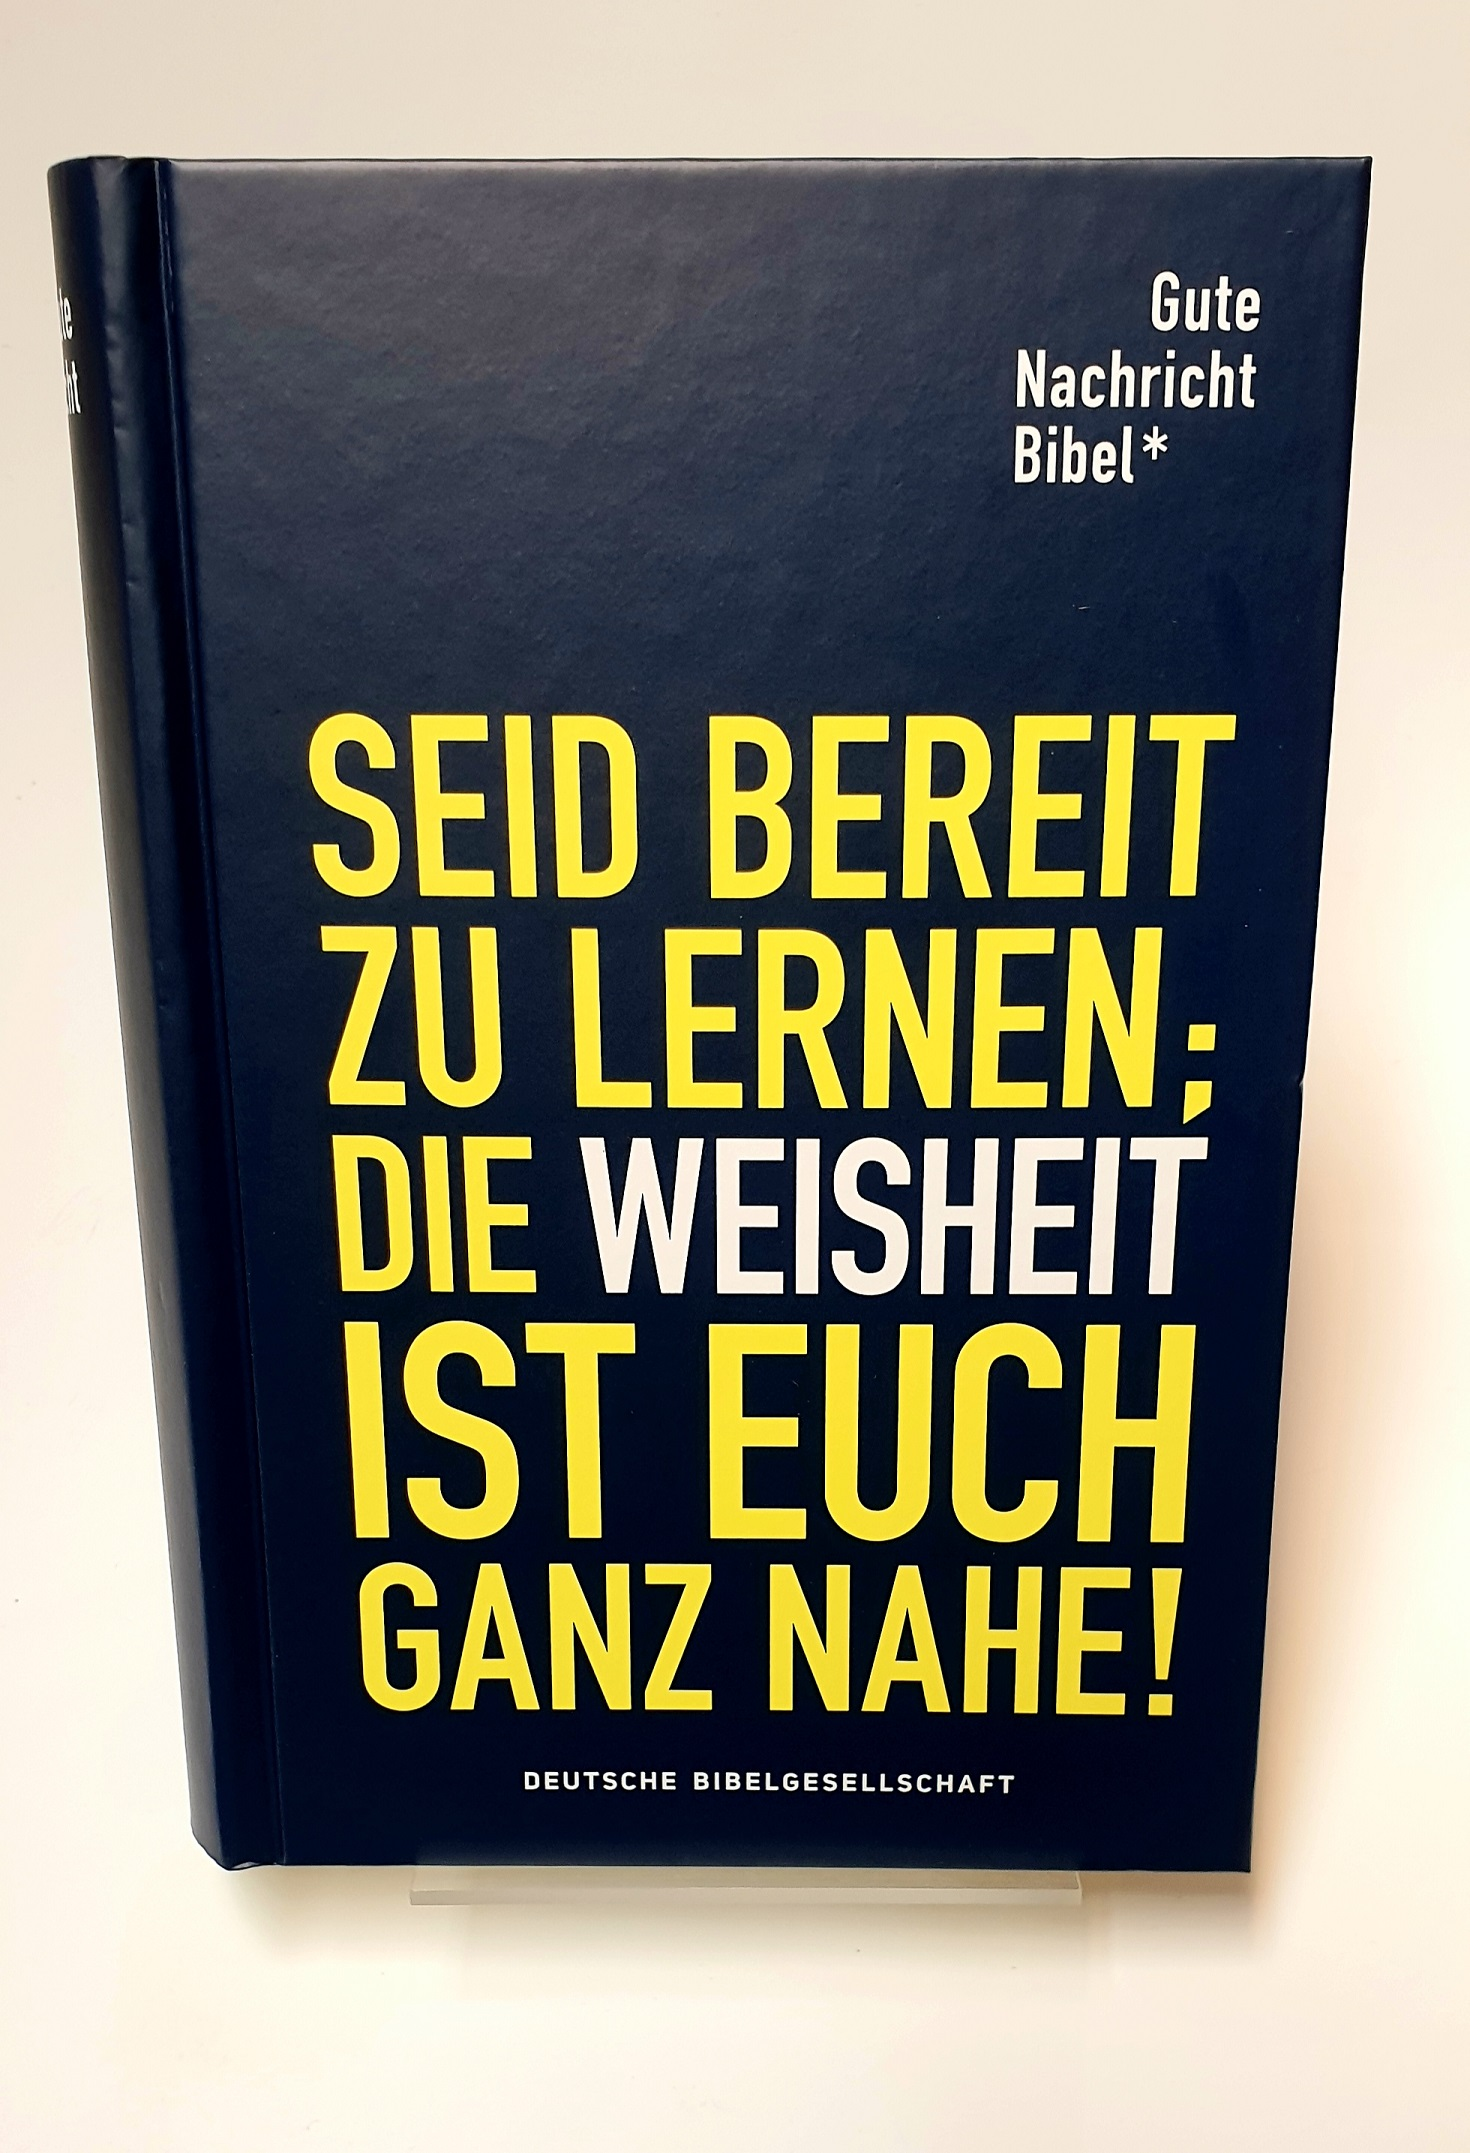 Tysk bibel gute nachricht artikelnummer 2499 via bibelbutiken.se